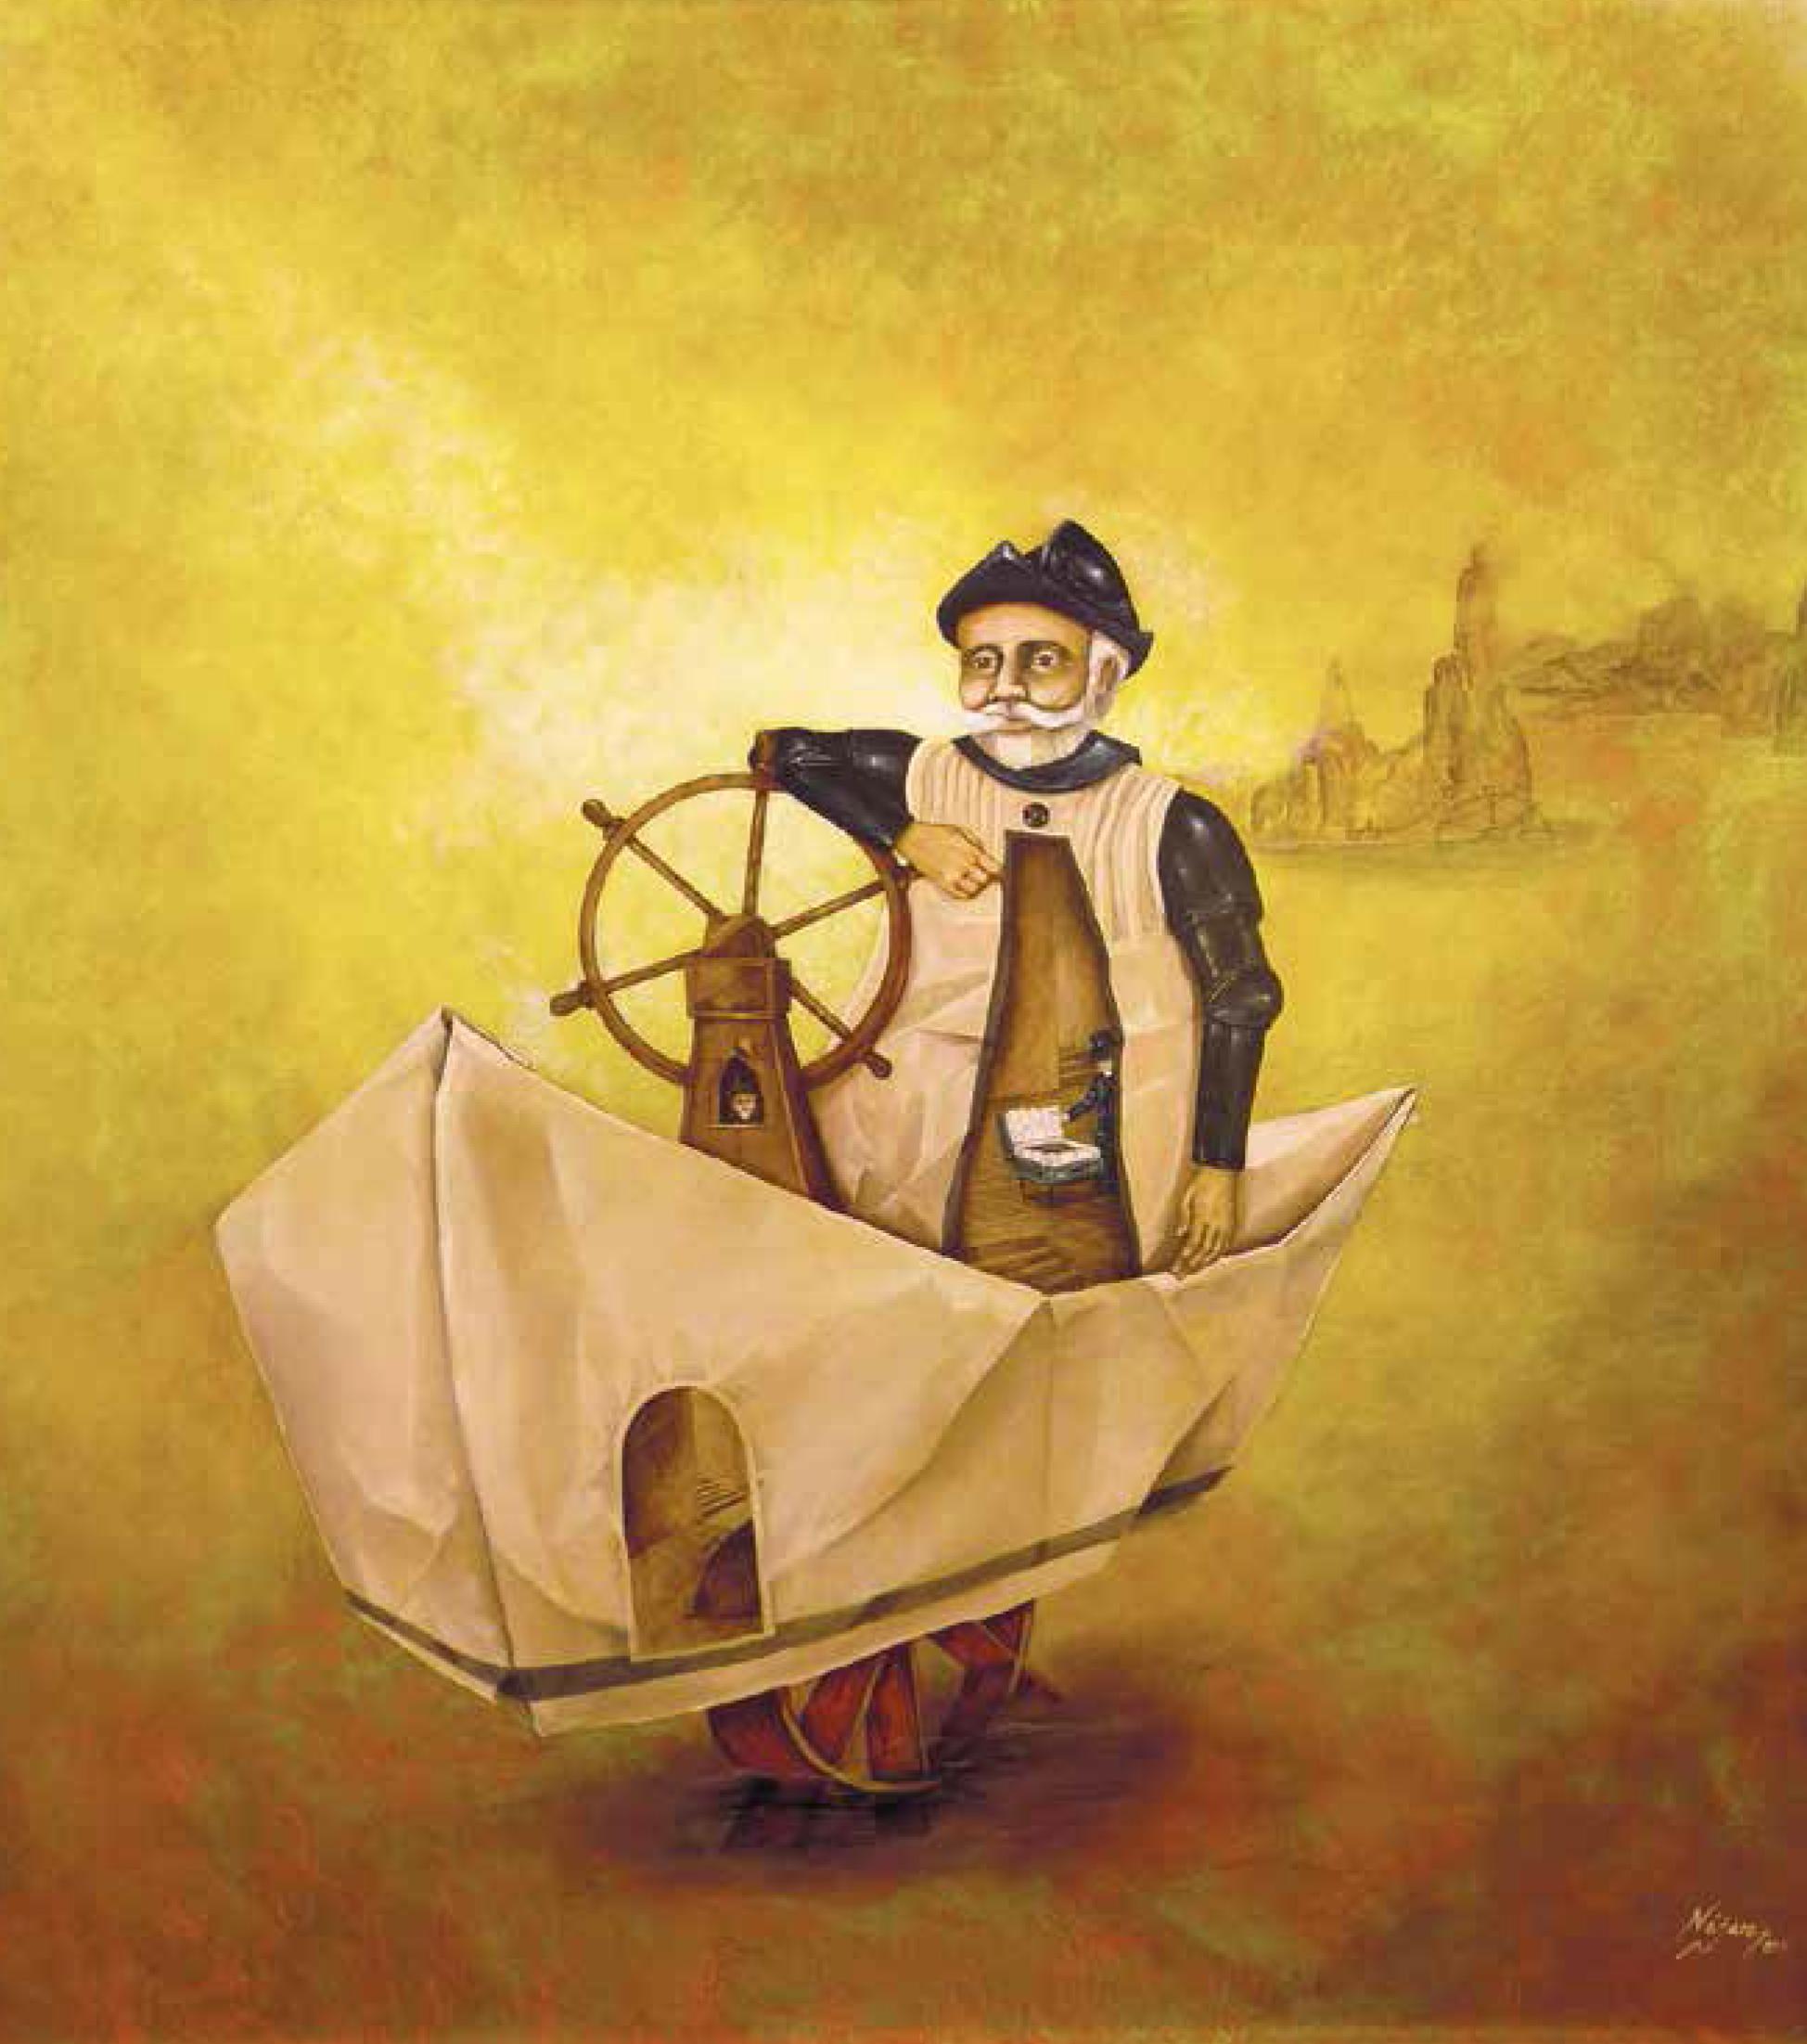 Saúl Nájera